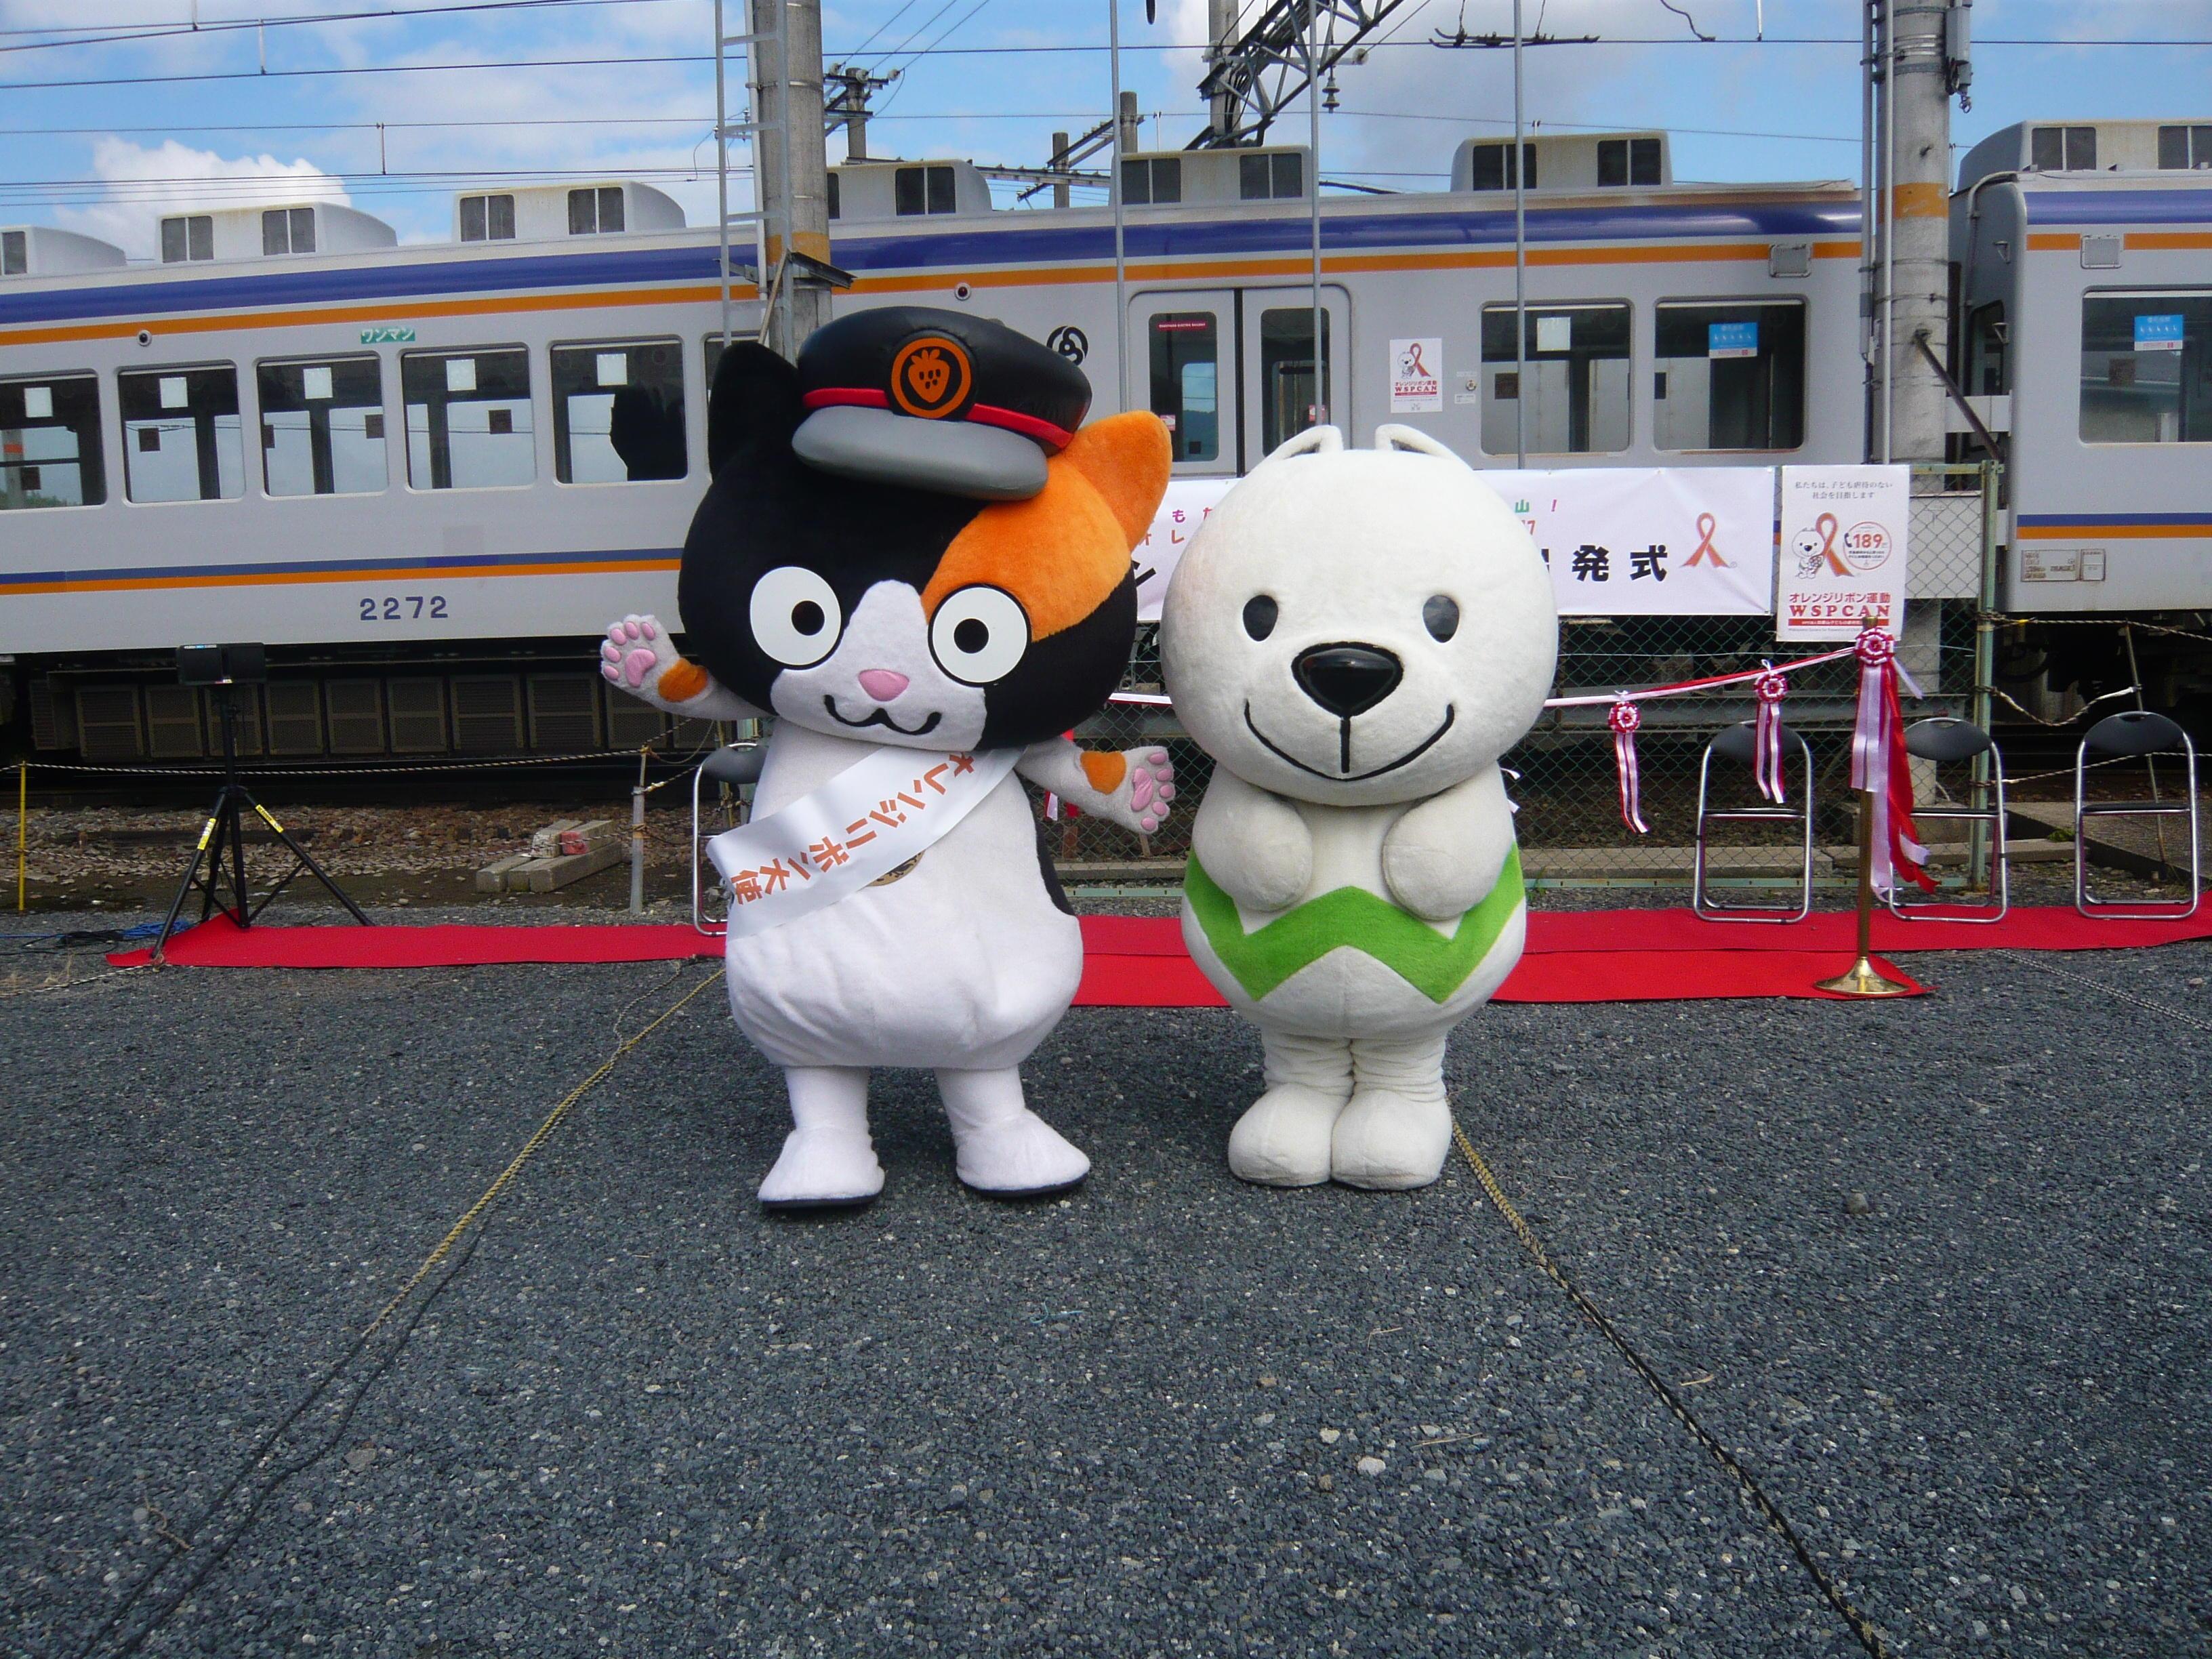 http://www.orangeribbon.jp/info/organization/1ef8eed8ee3704f3bfadb0367c774f669b70108d.JPG